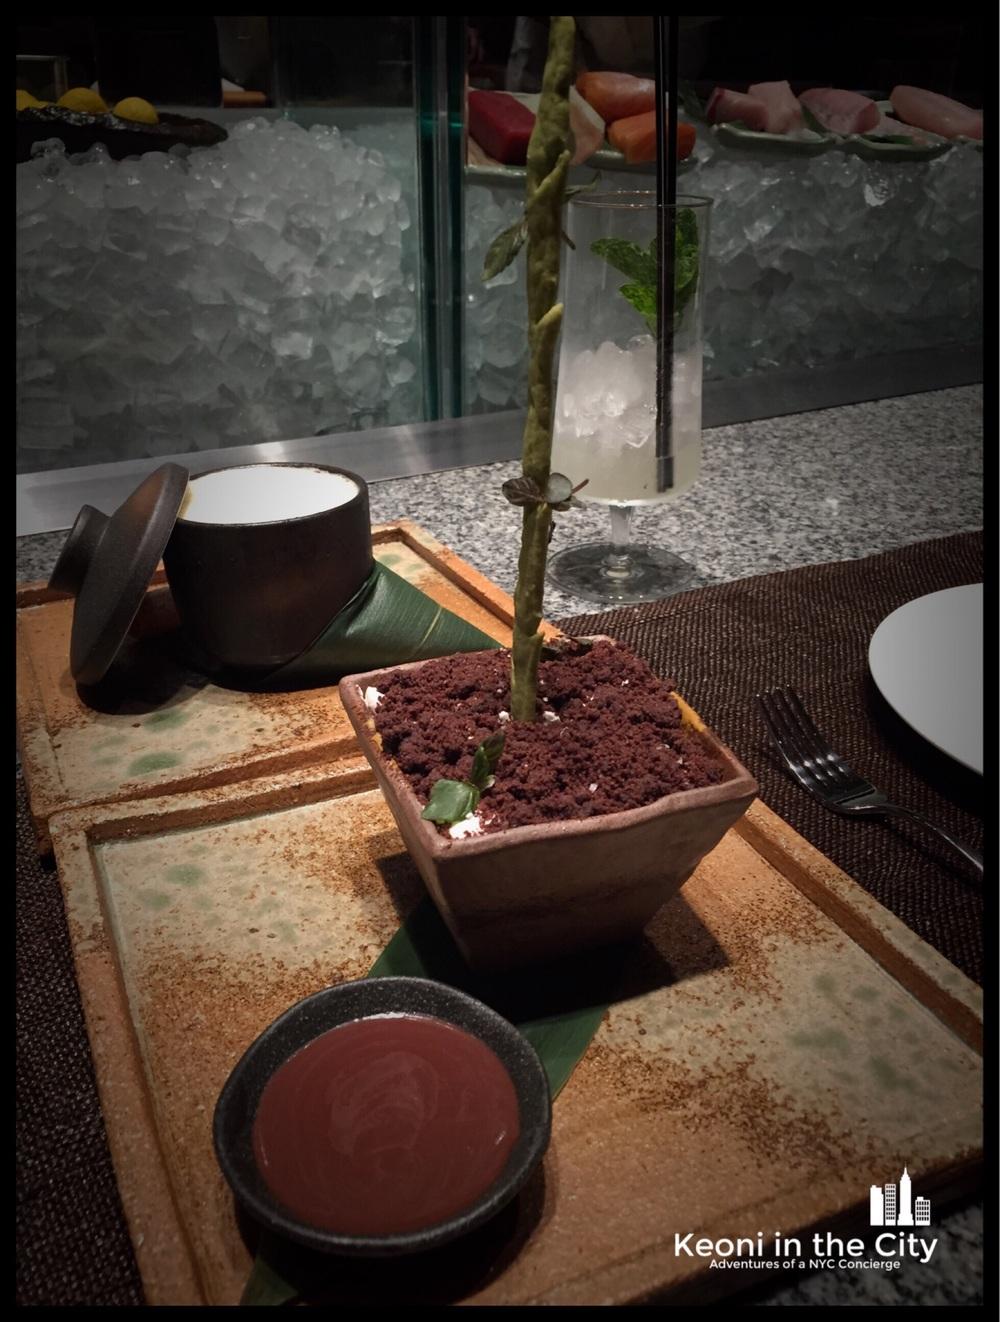 Zuma bamboo dessert